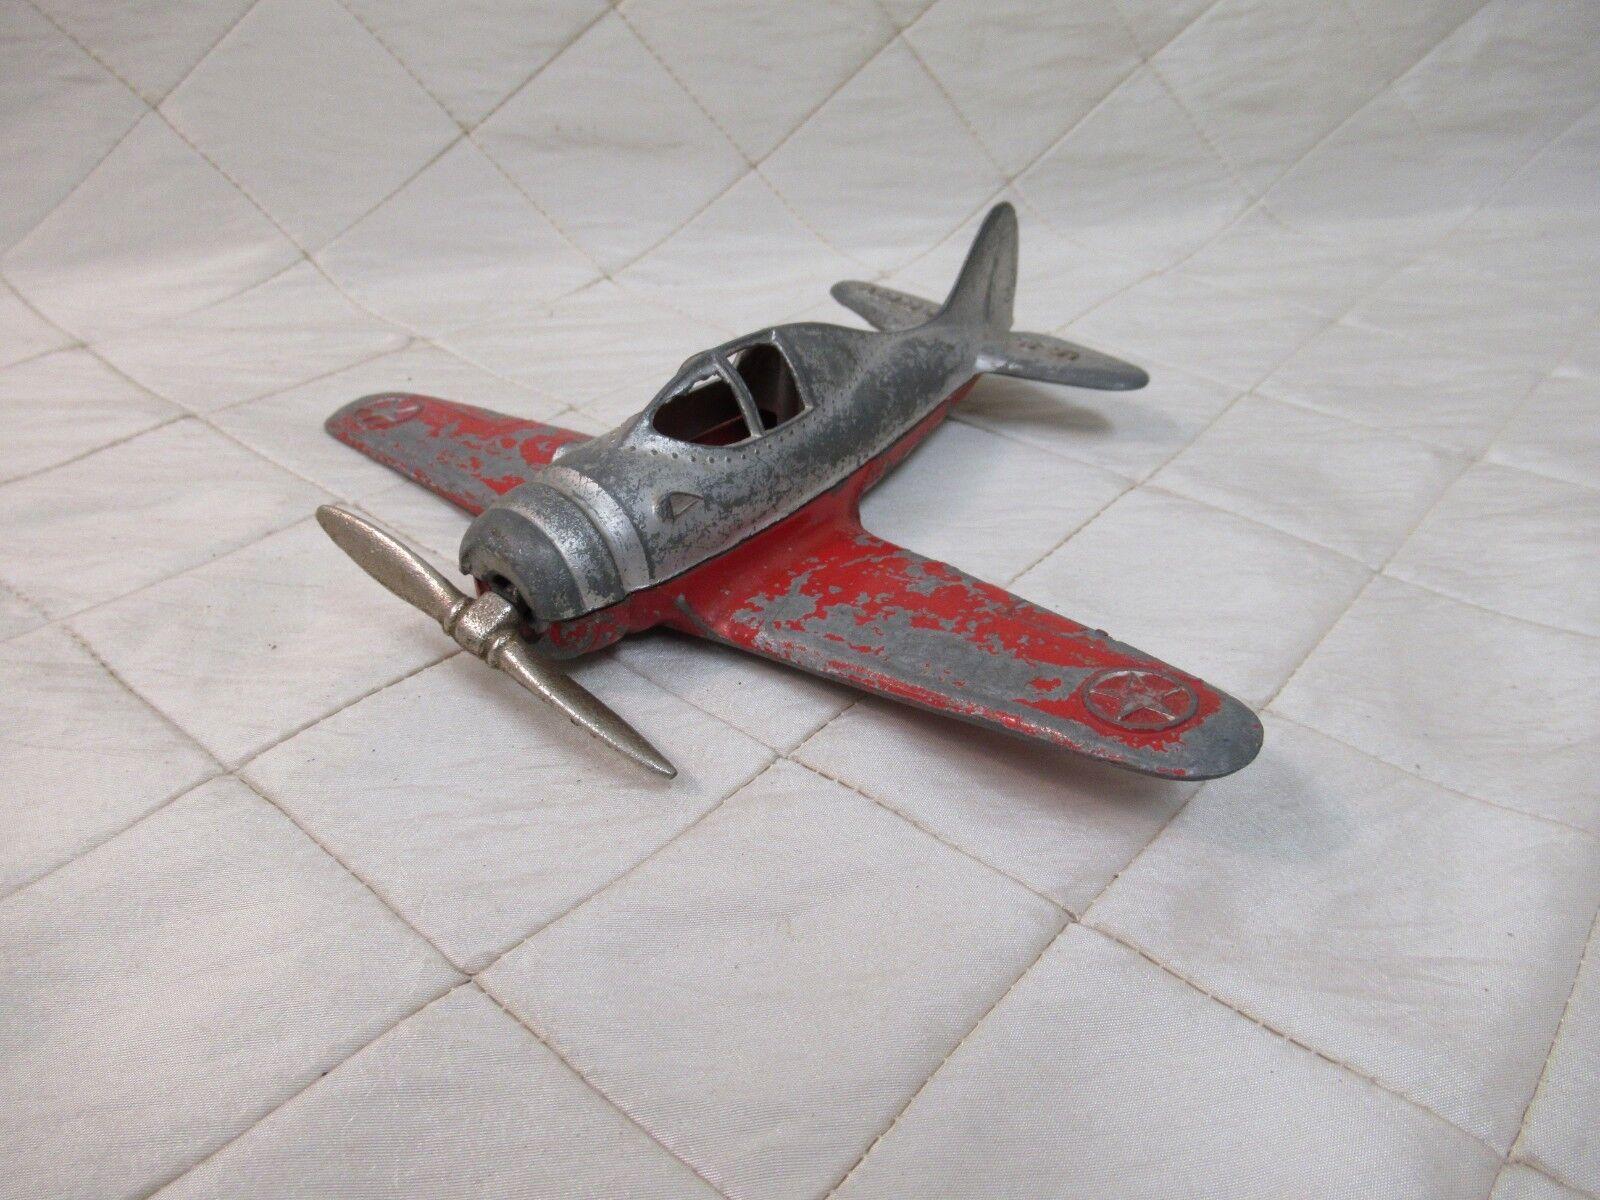 Vintage Antique Hubley Kiddie Toy Plane US Army Red  Diecast 6 inch Airplane